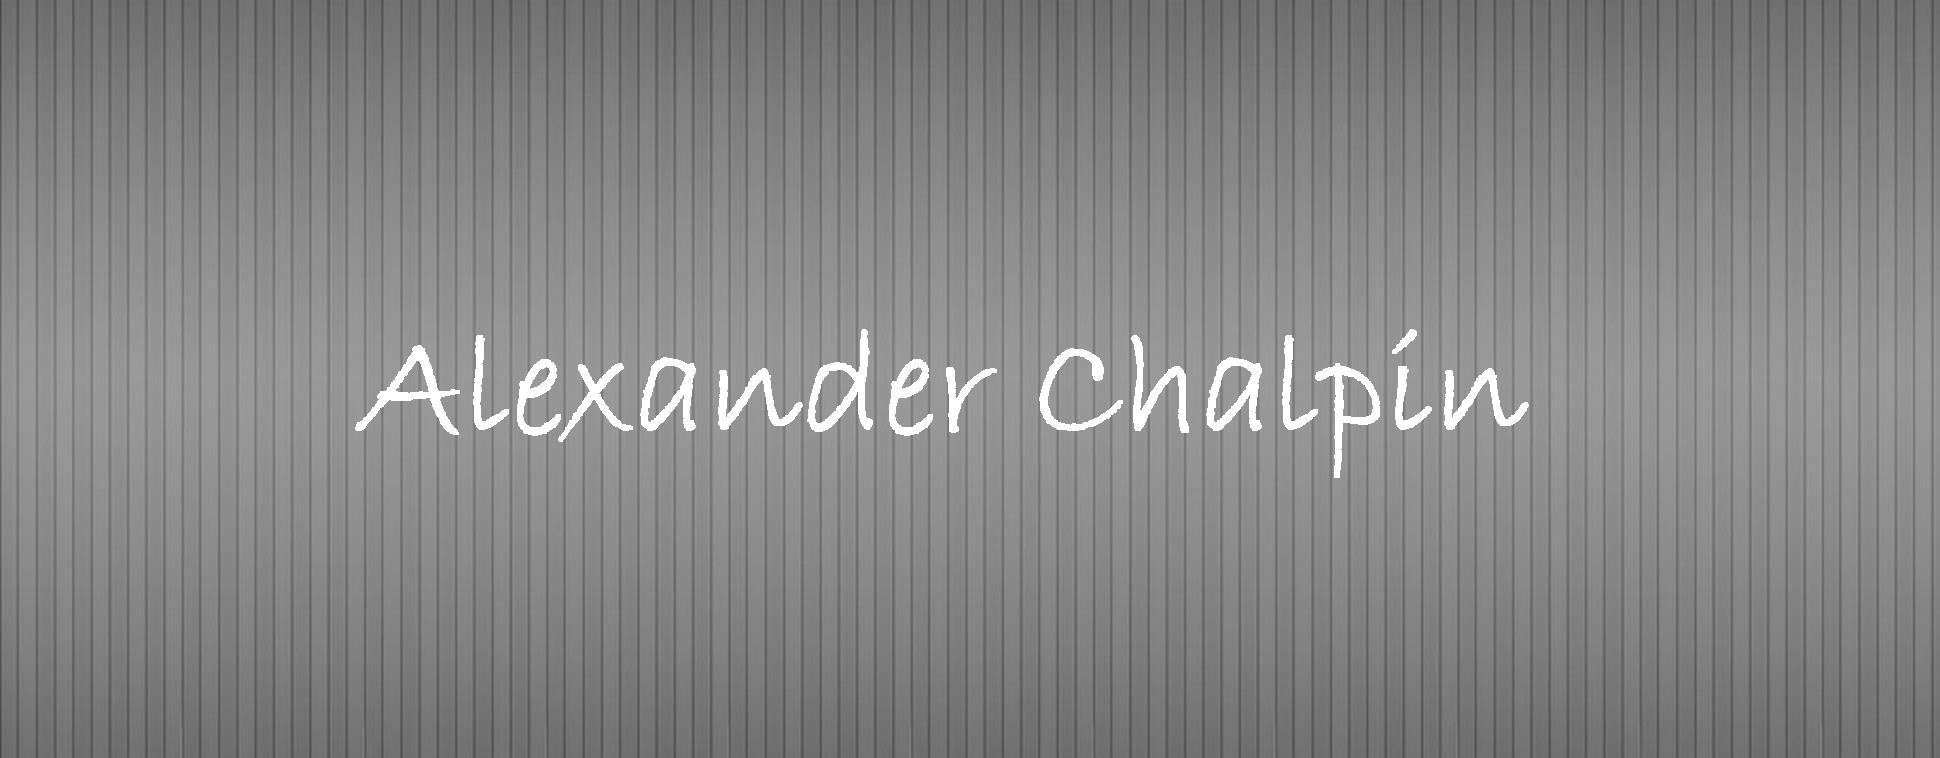 Alexander Chalpin.jpg